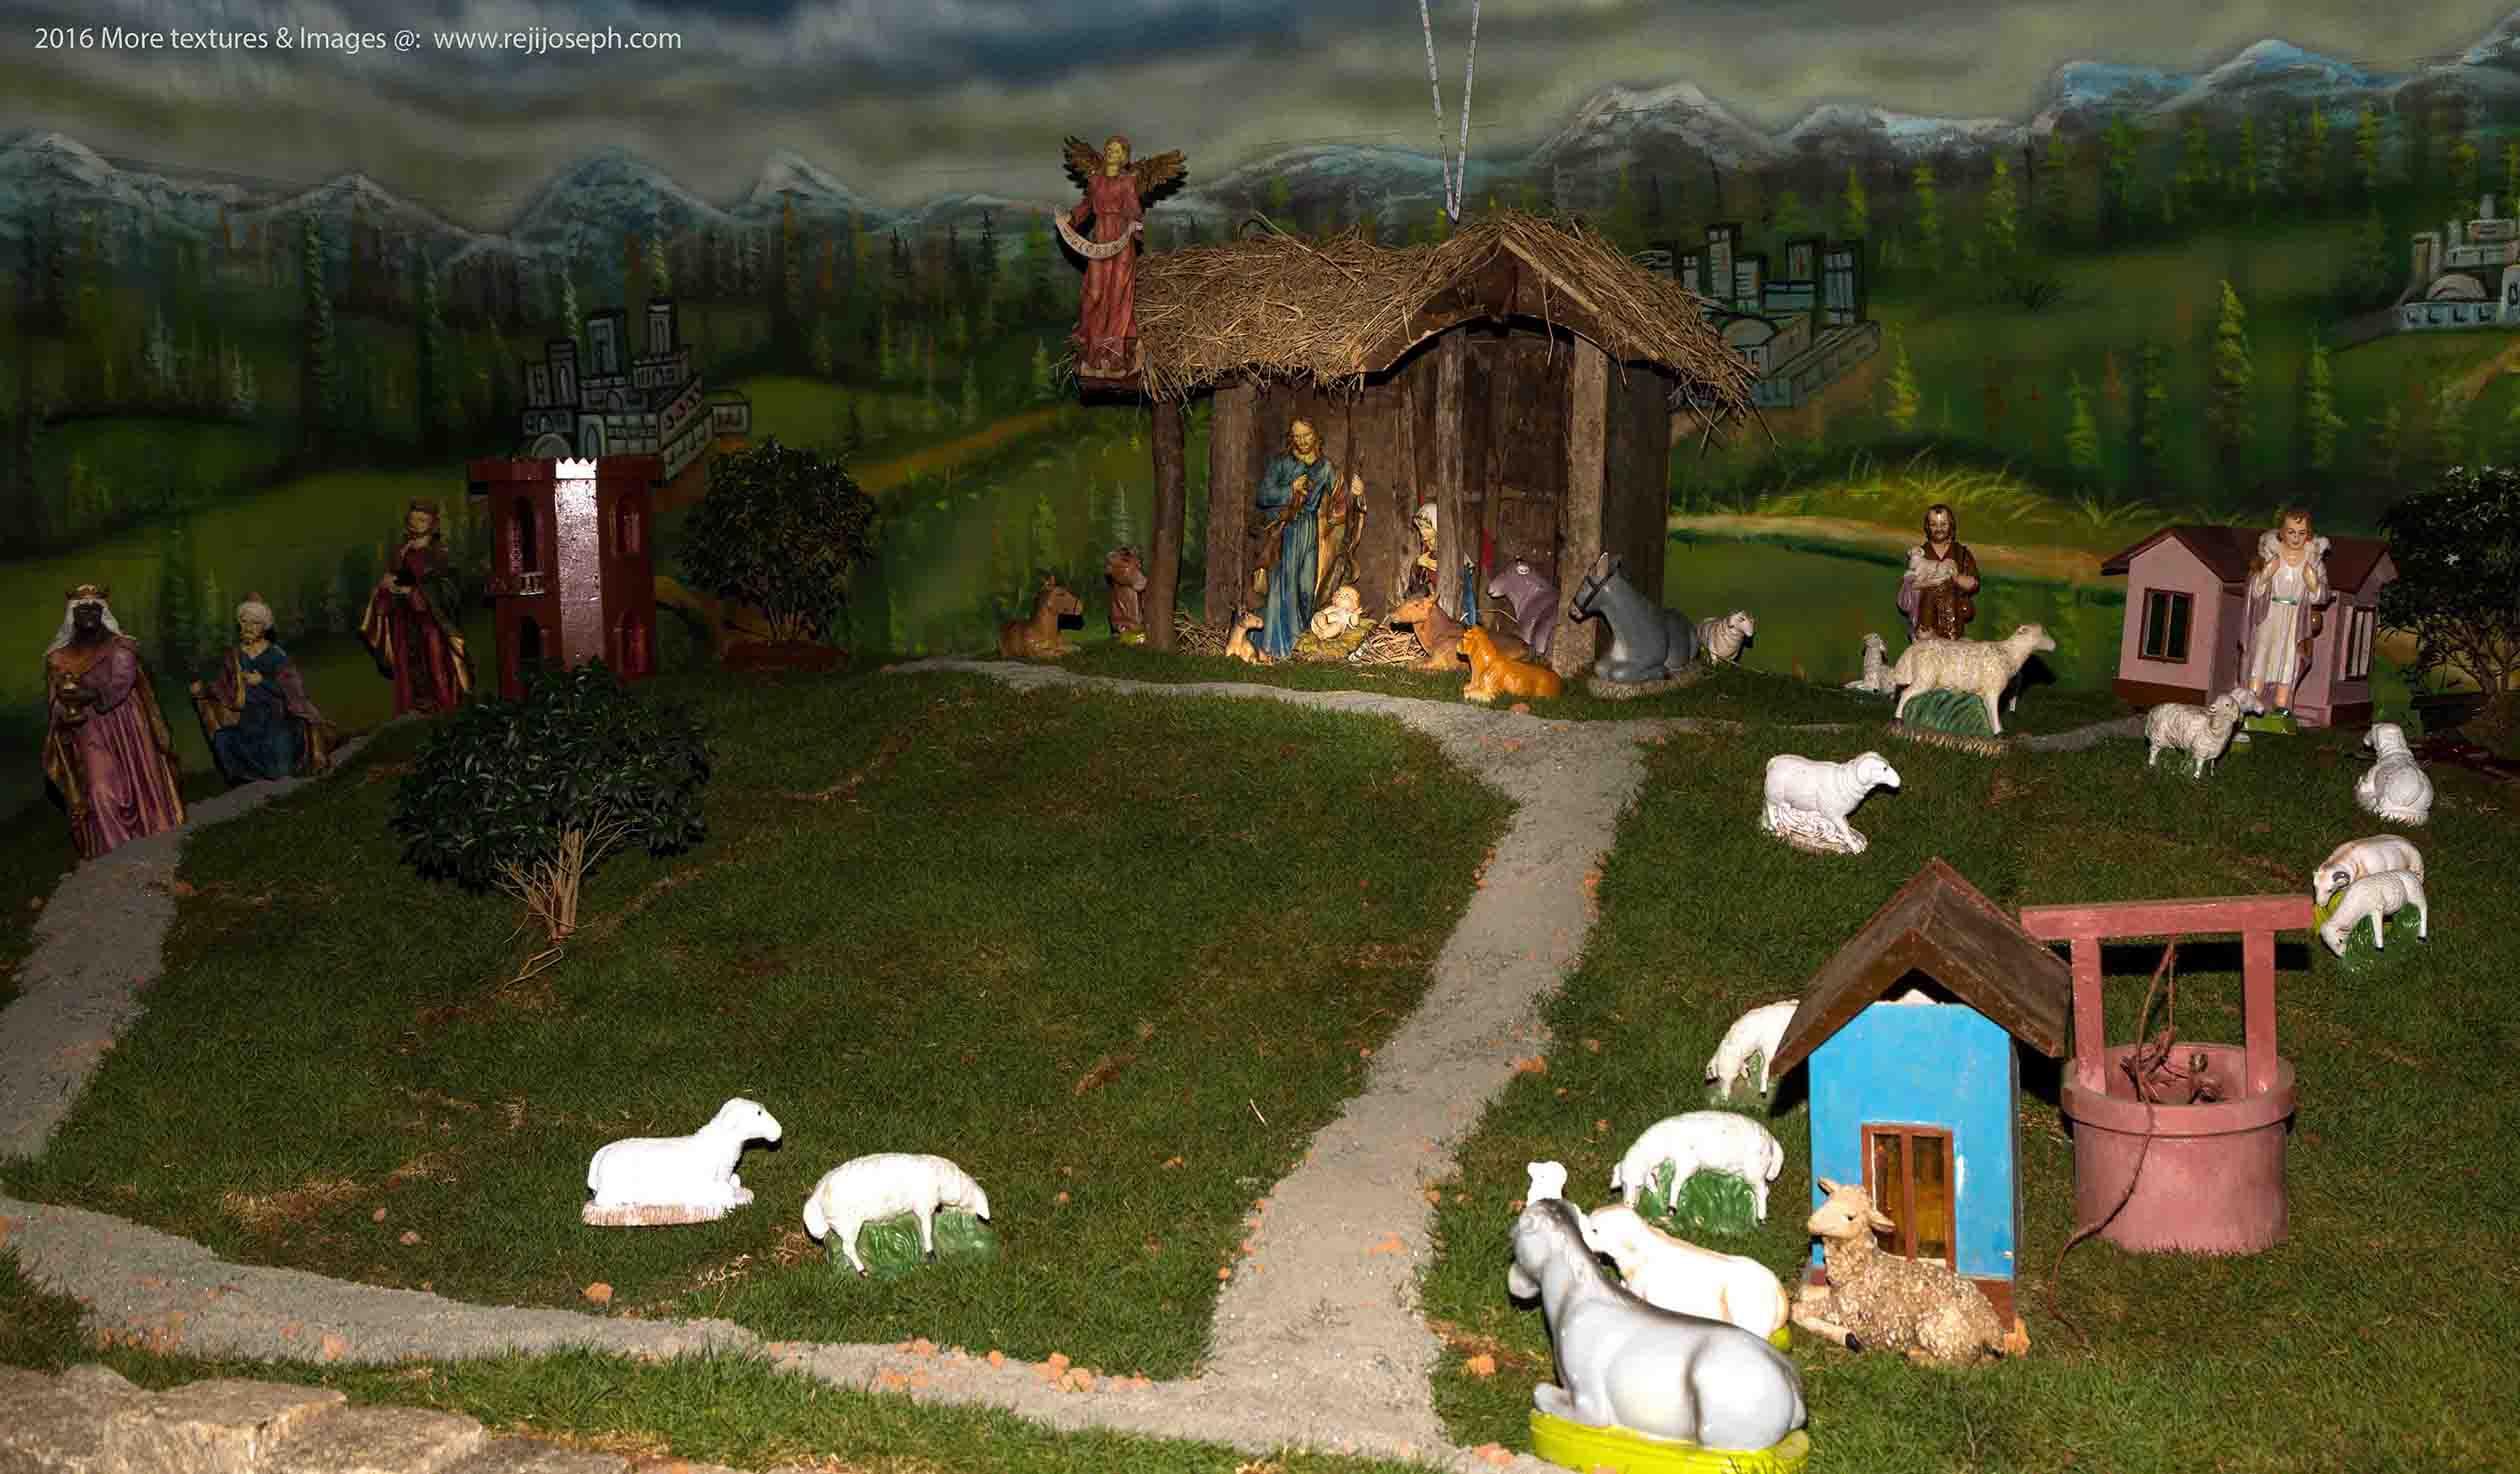 Christmas crib Pulkoodu St. Mary's Basilica Ernakulam 00002